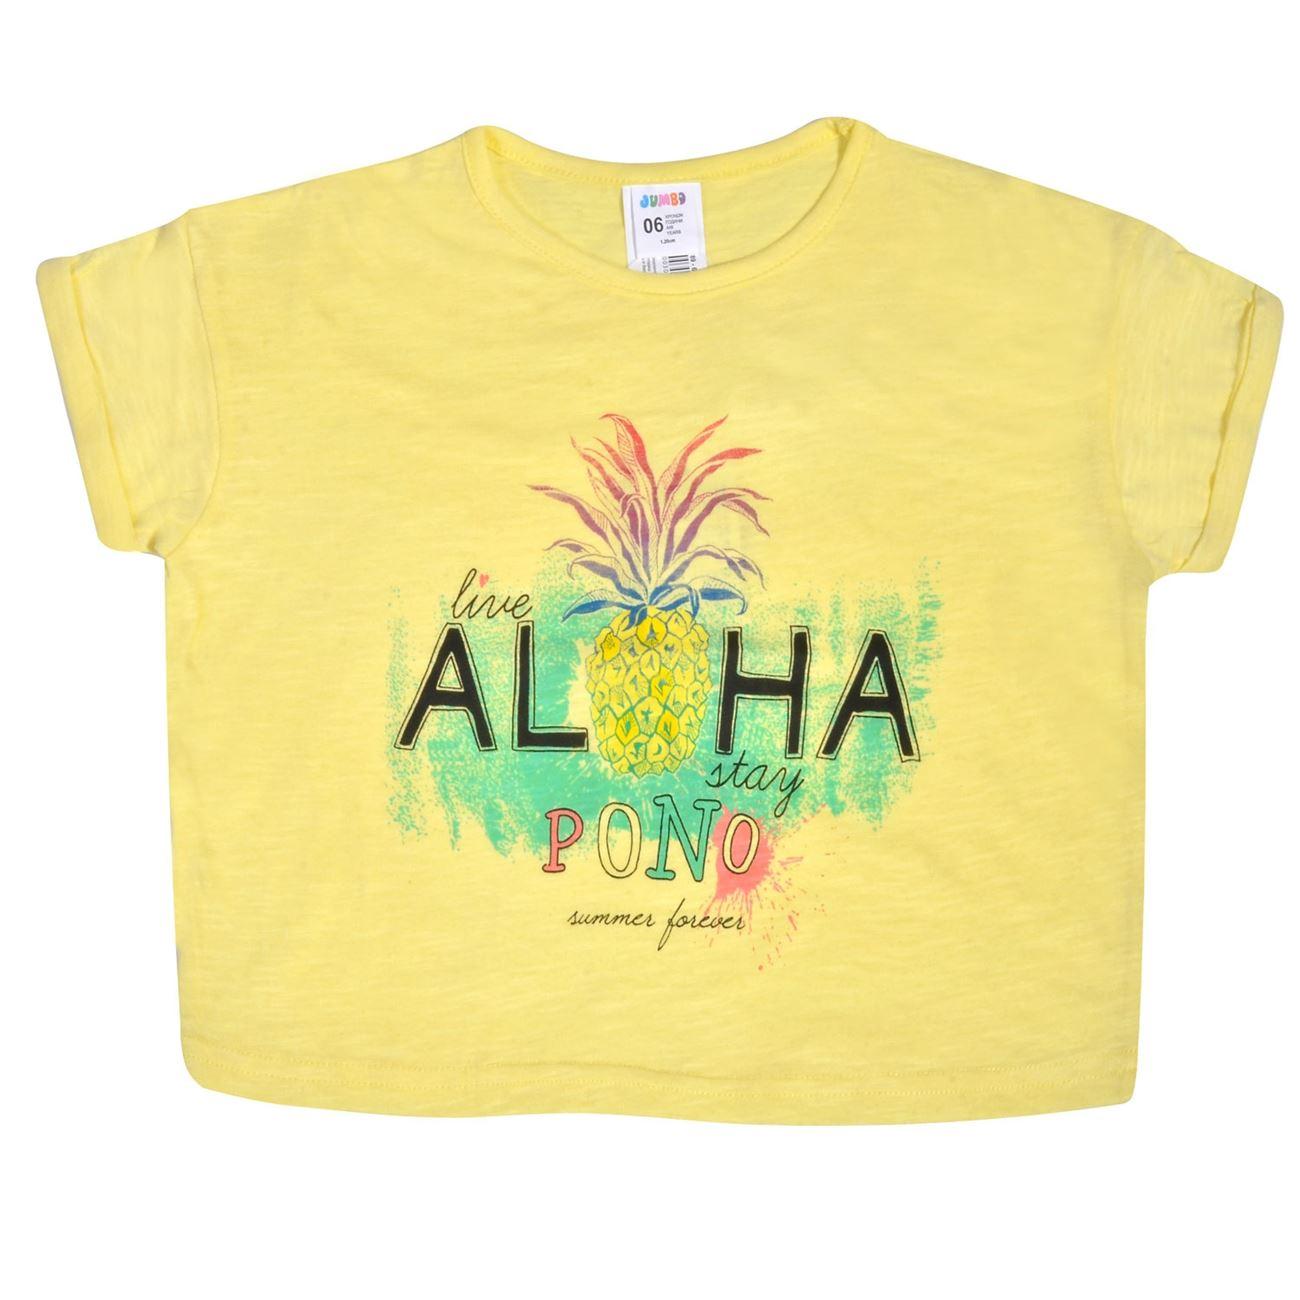 81d6d761a262 Μπλουζάκι Παιδικό Crop Top Κίτρινο Ανανάς   Κοντομάνικα για Κορίτσια 4-6  Ετών